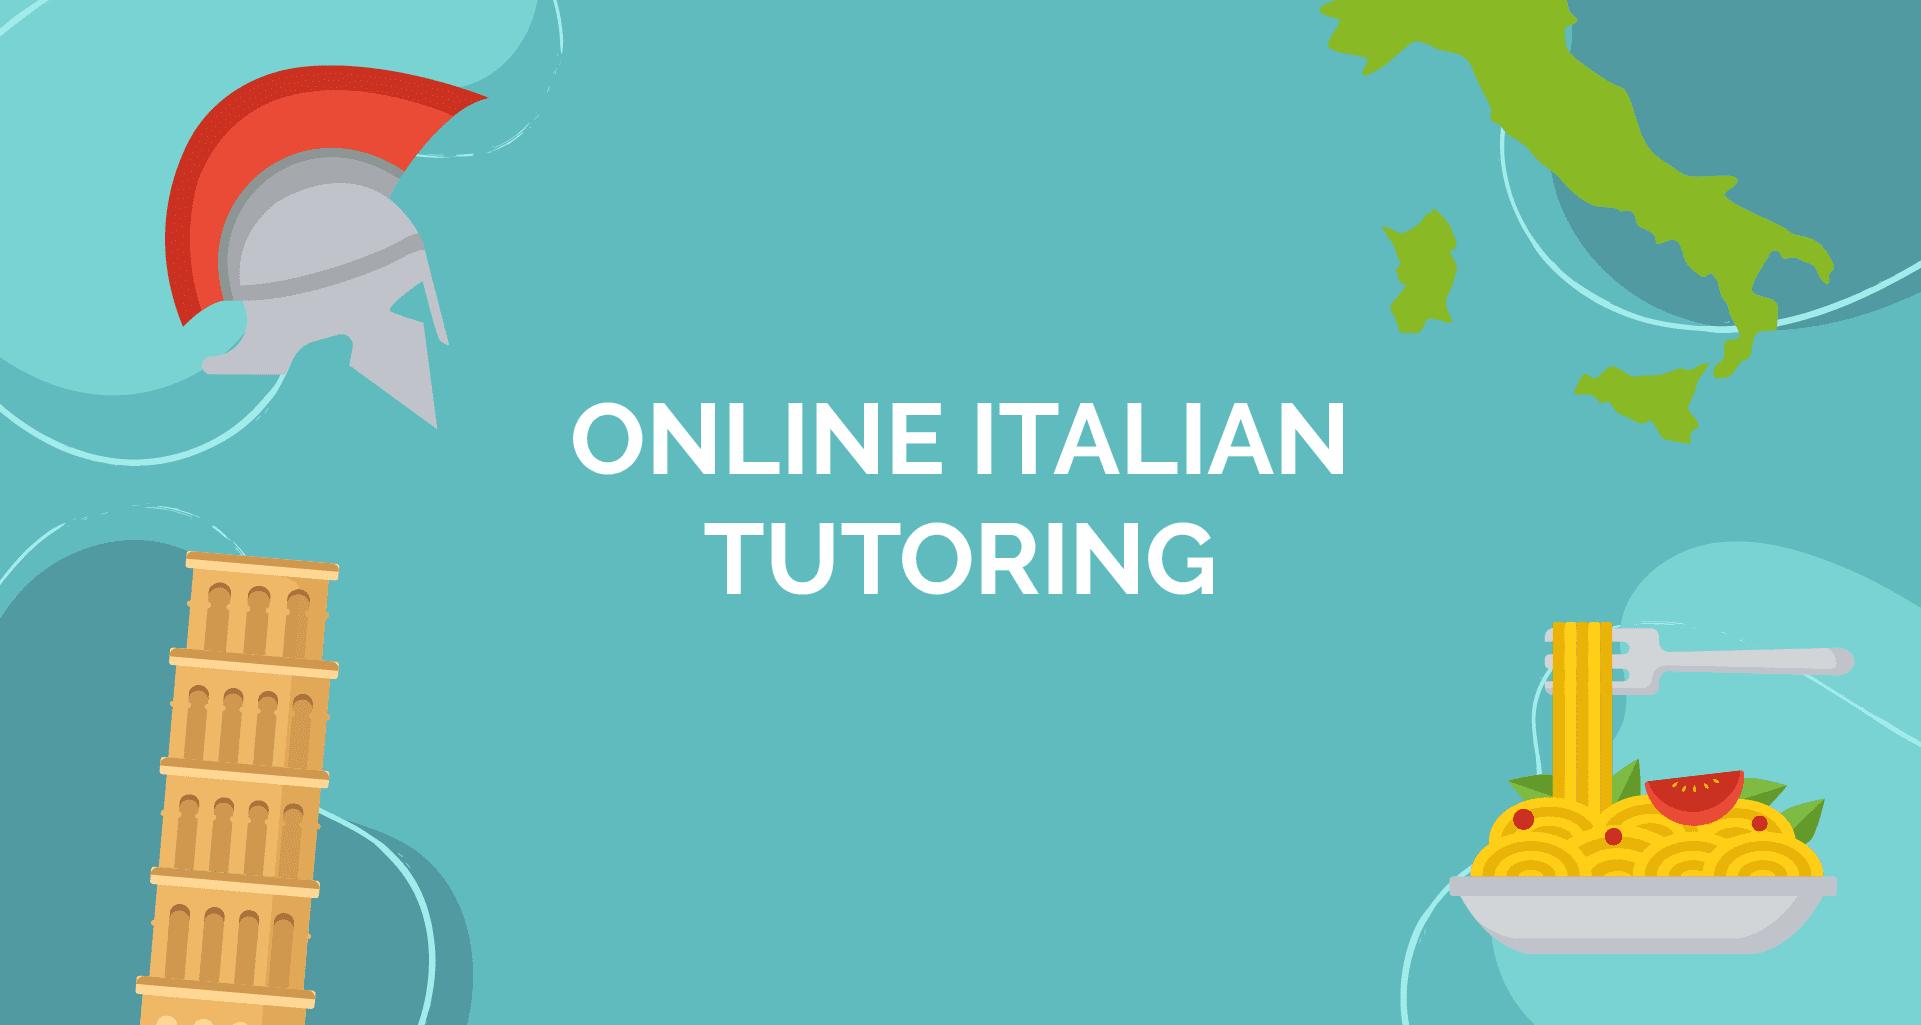 online italian tutoring